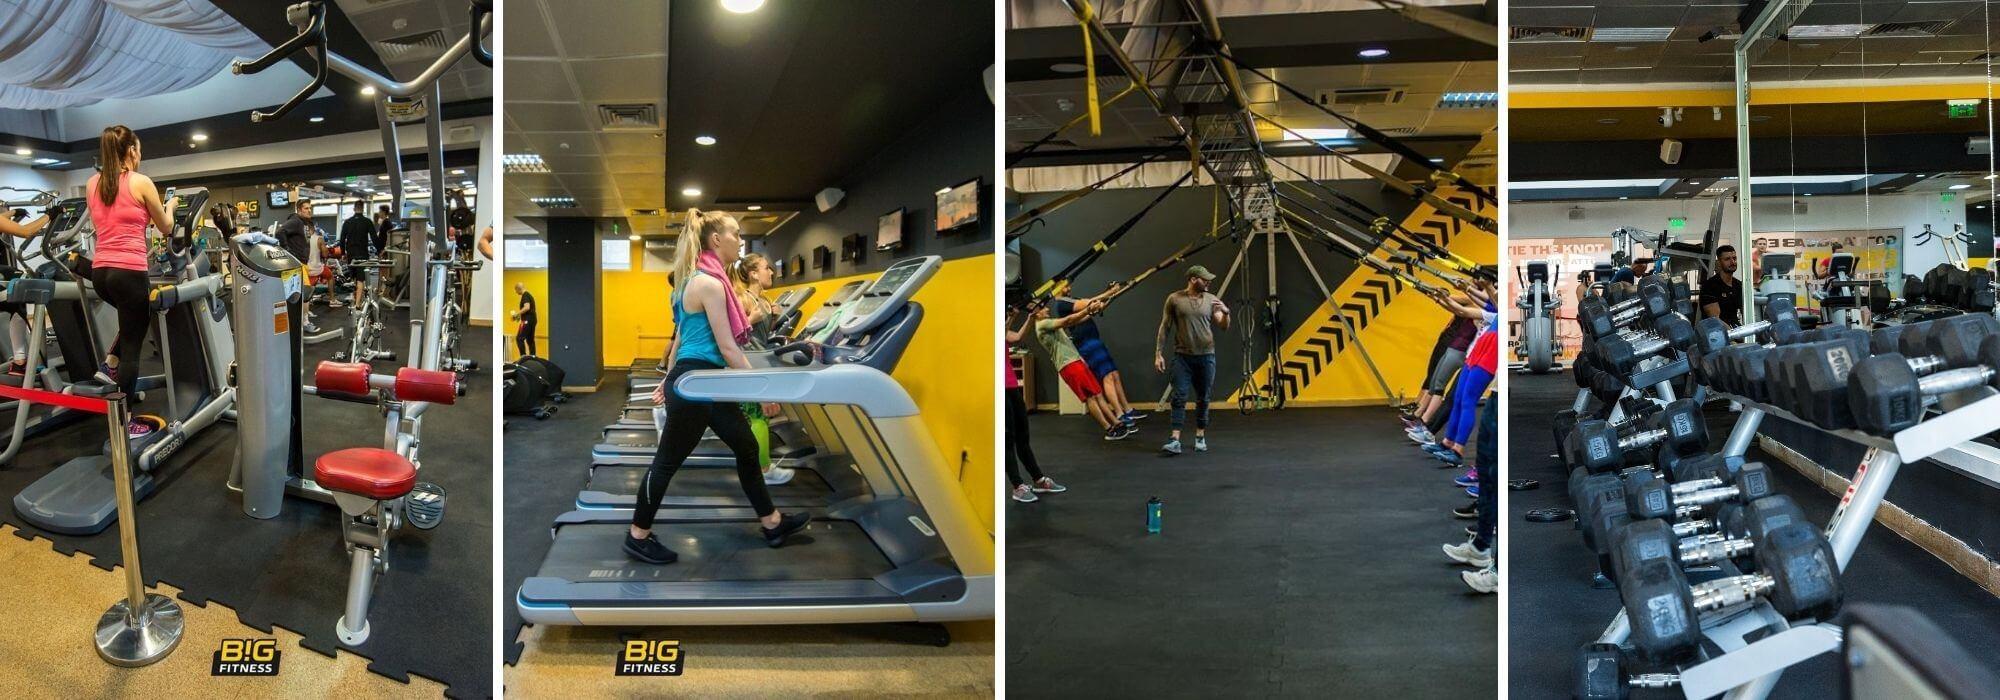 echipare sala fitness cluj